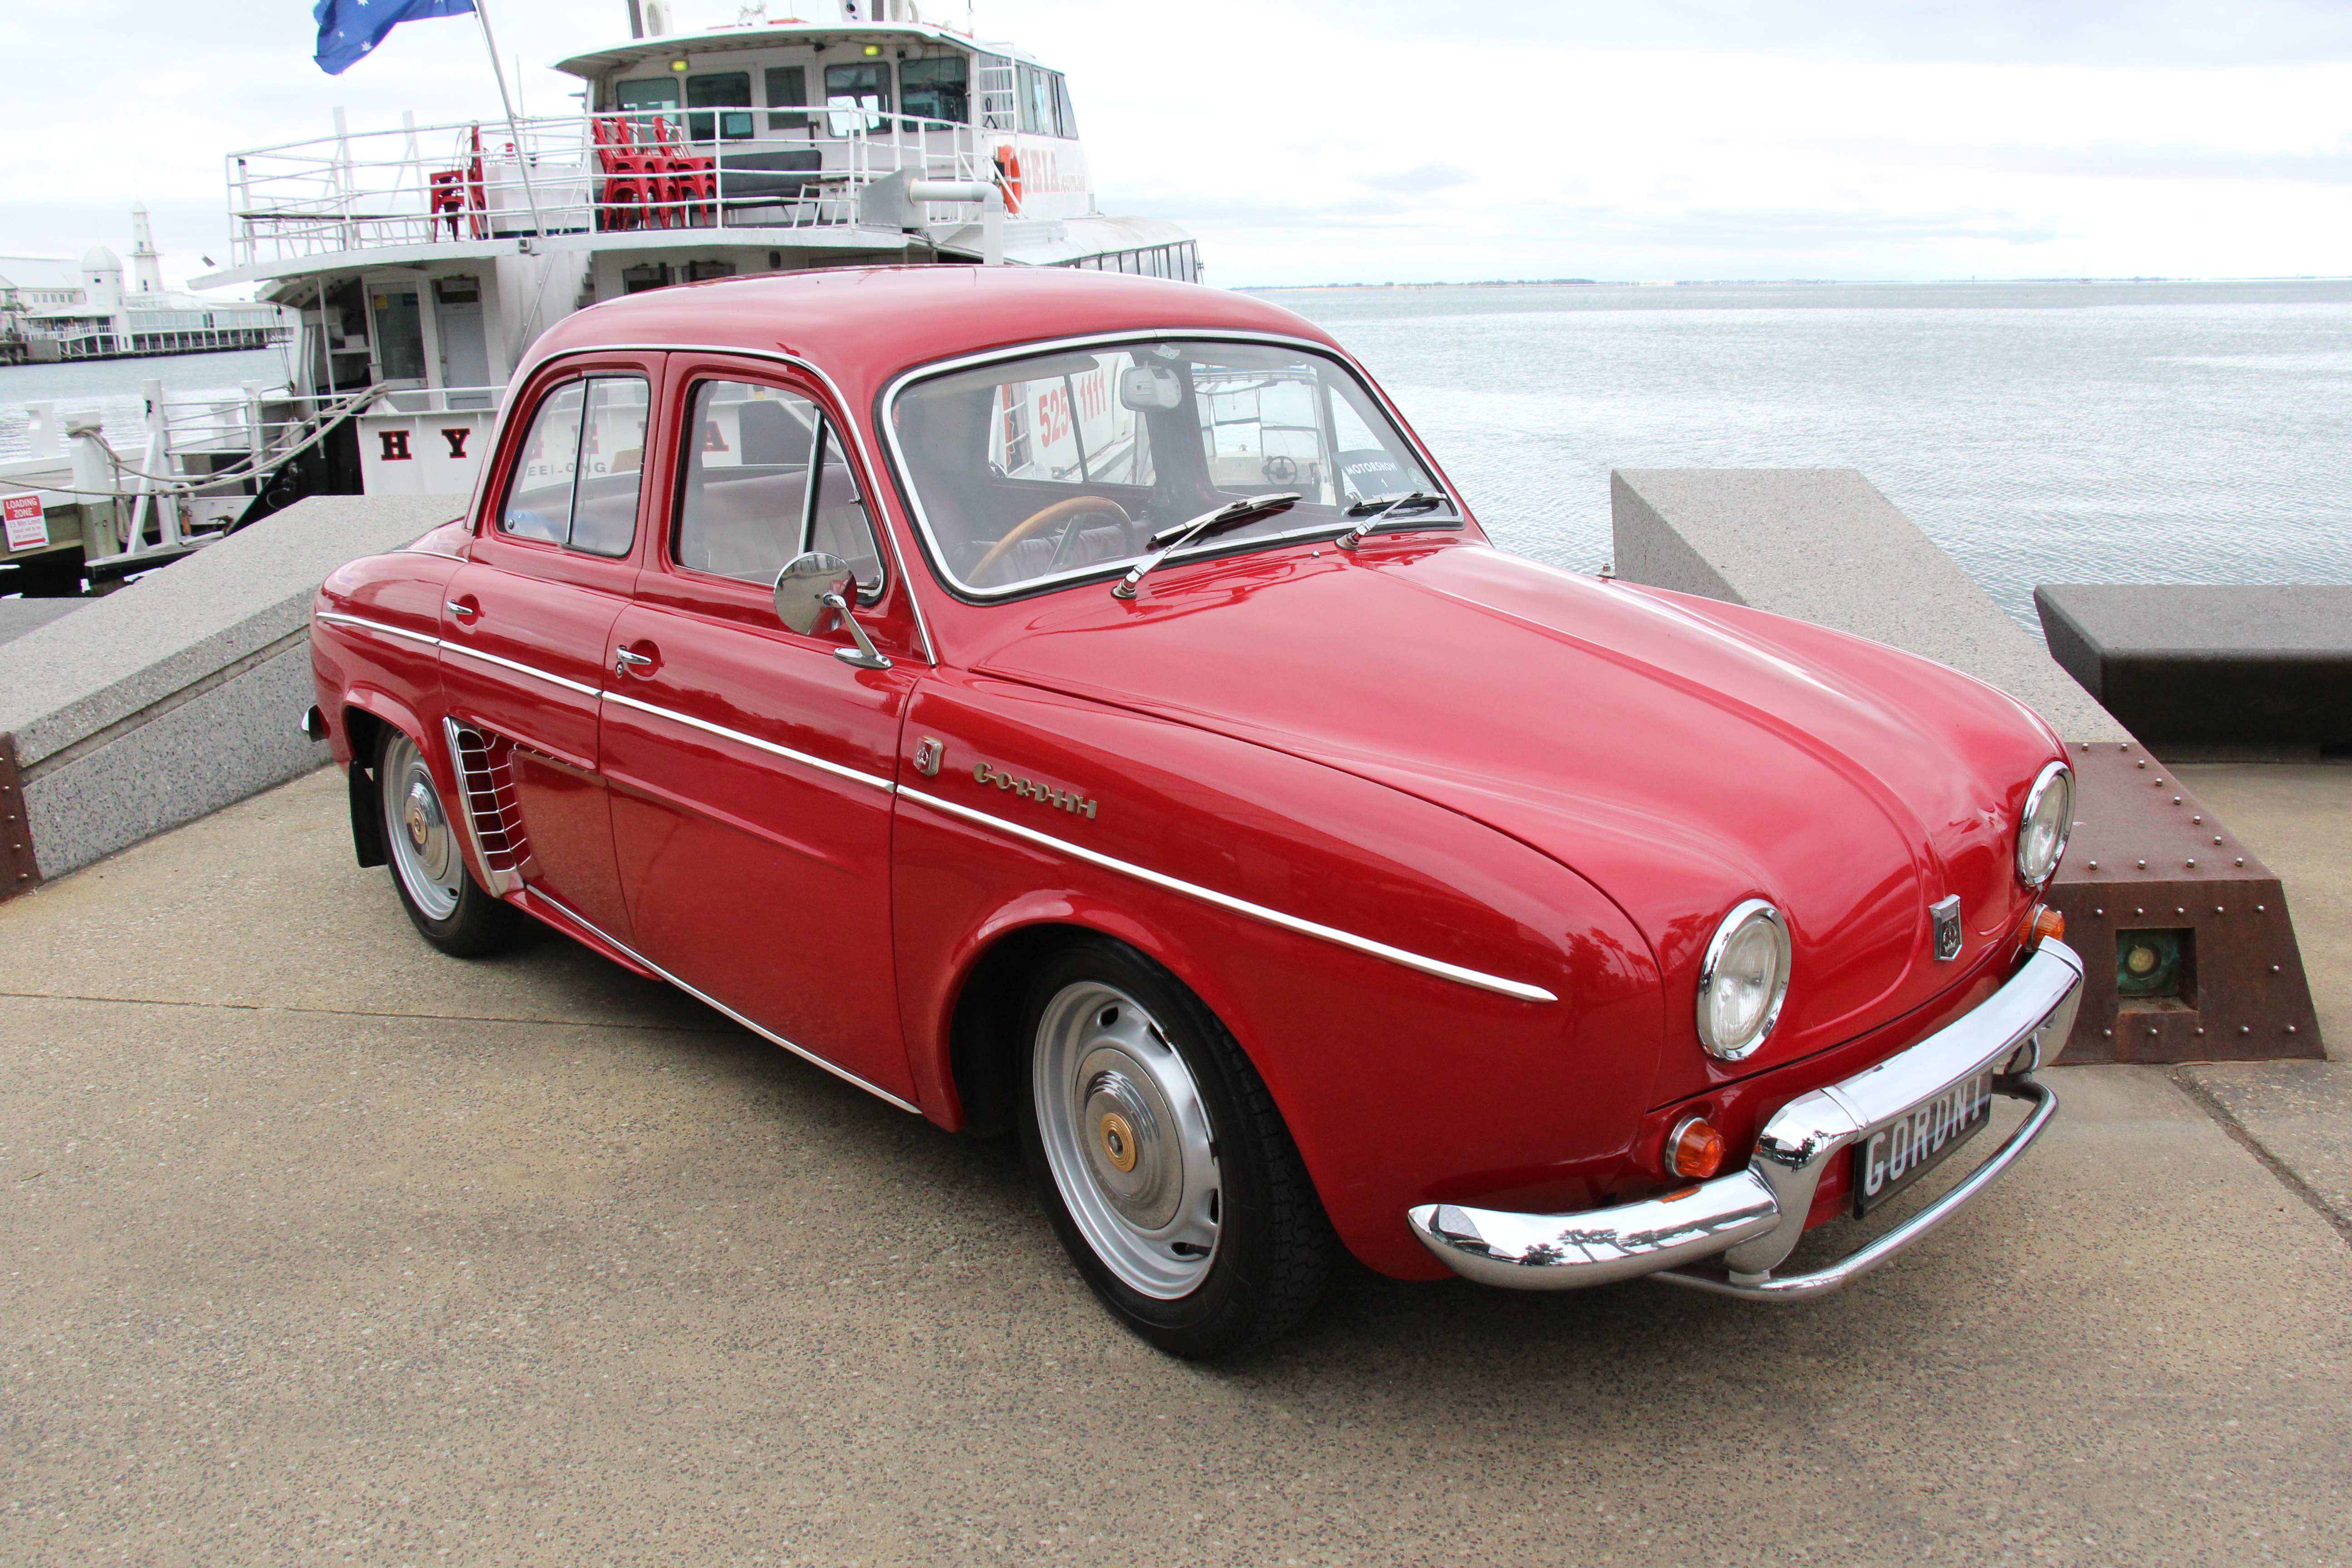 Ficheiro 1961 Renault Dauphine Gordini 31290981735 Jpg Wikipedia A Enciclopedia Livre